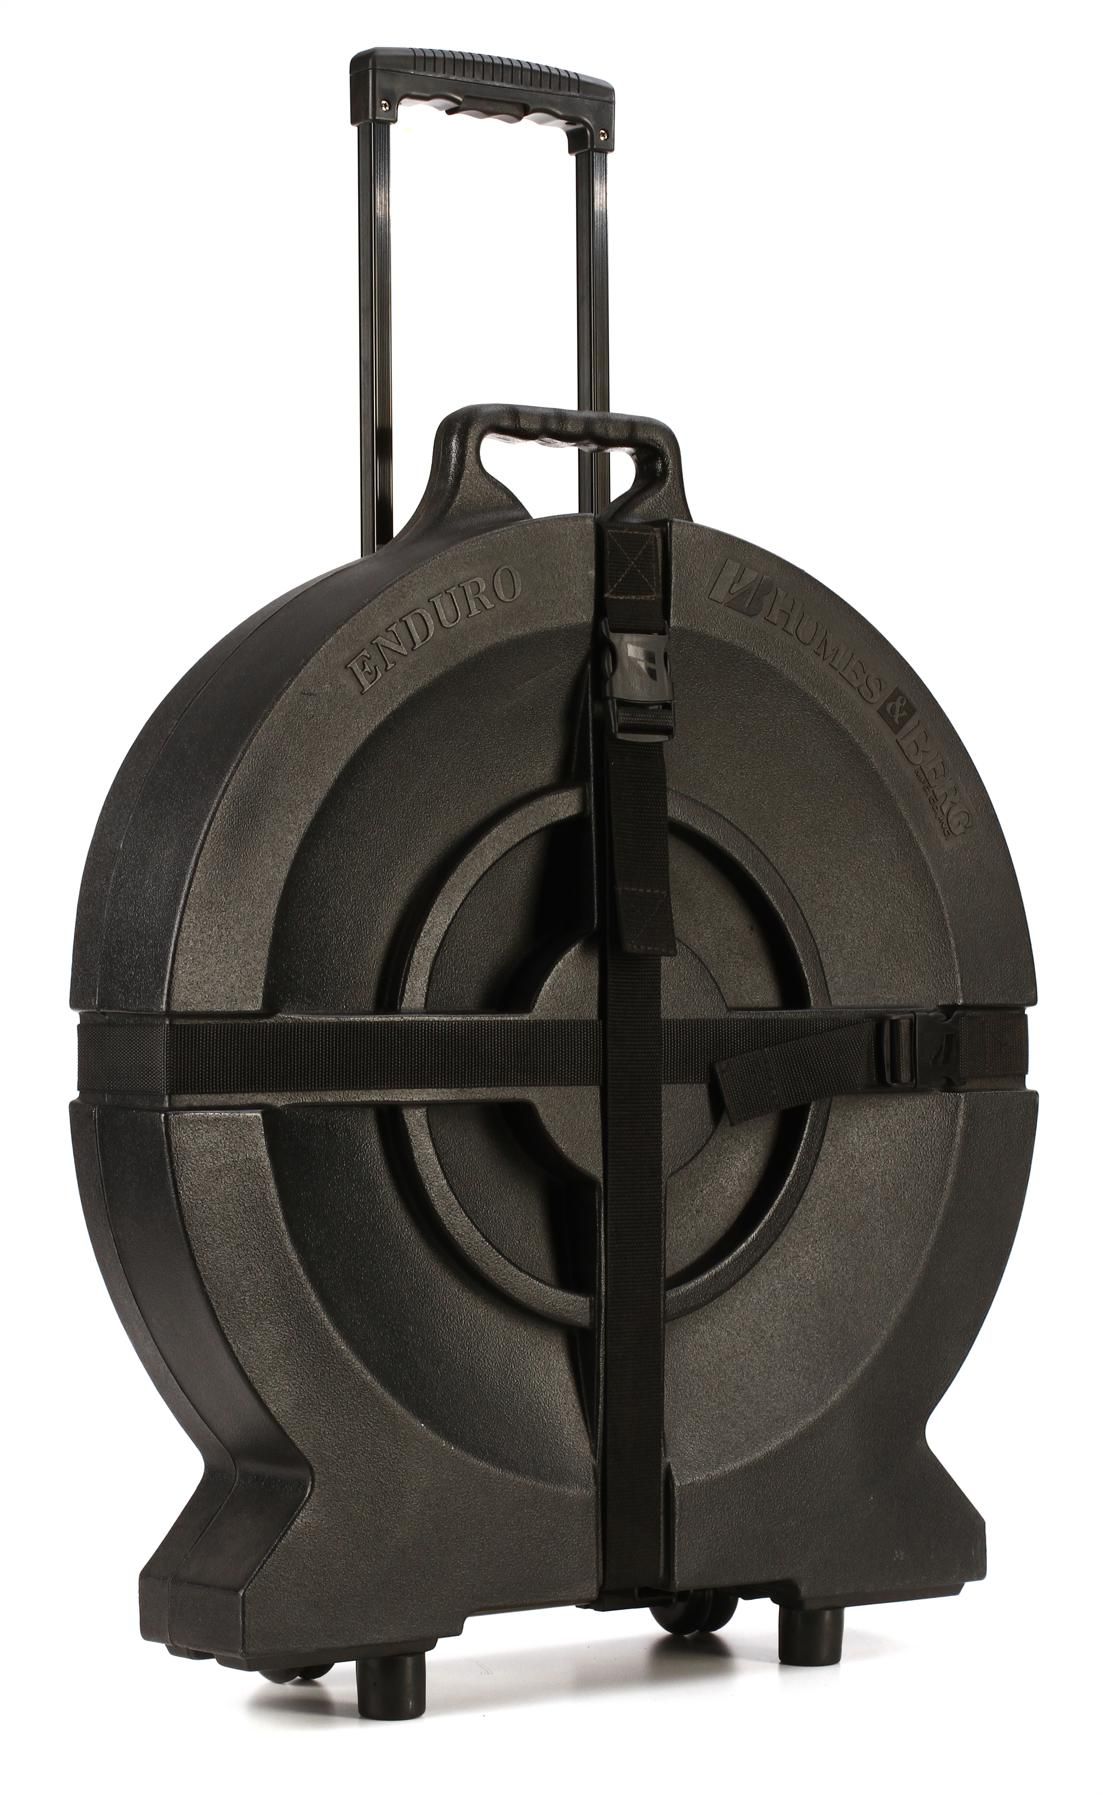 "Humes & Berg 22"" Enduro Cymbal Case"